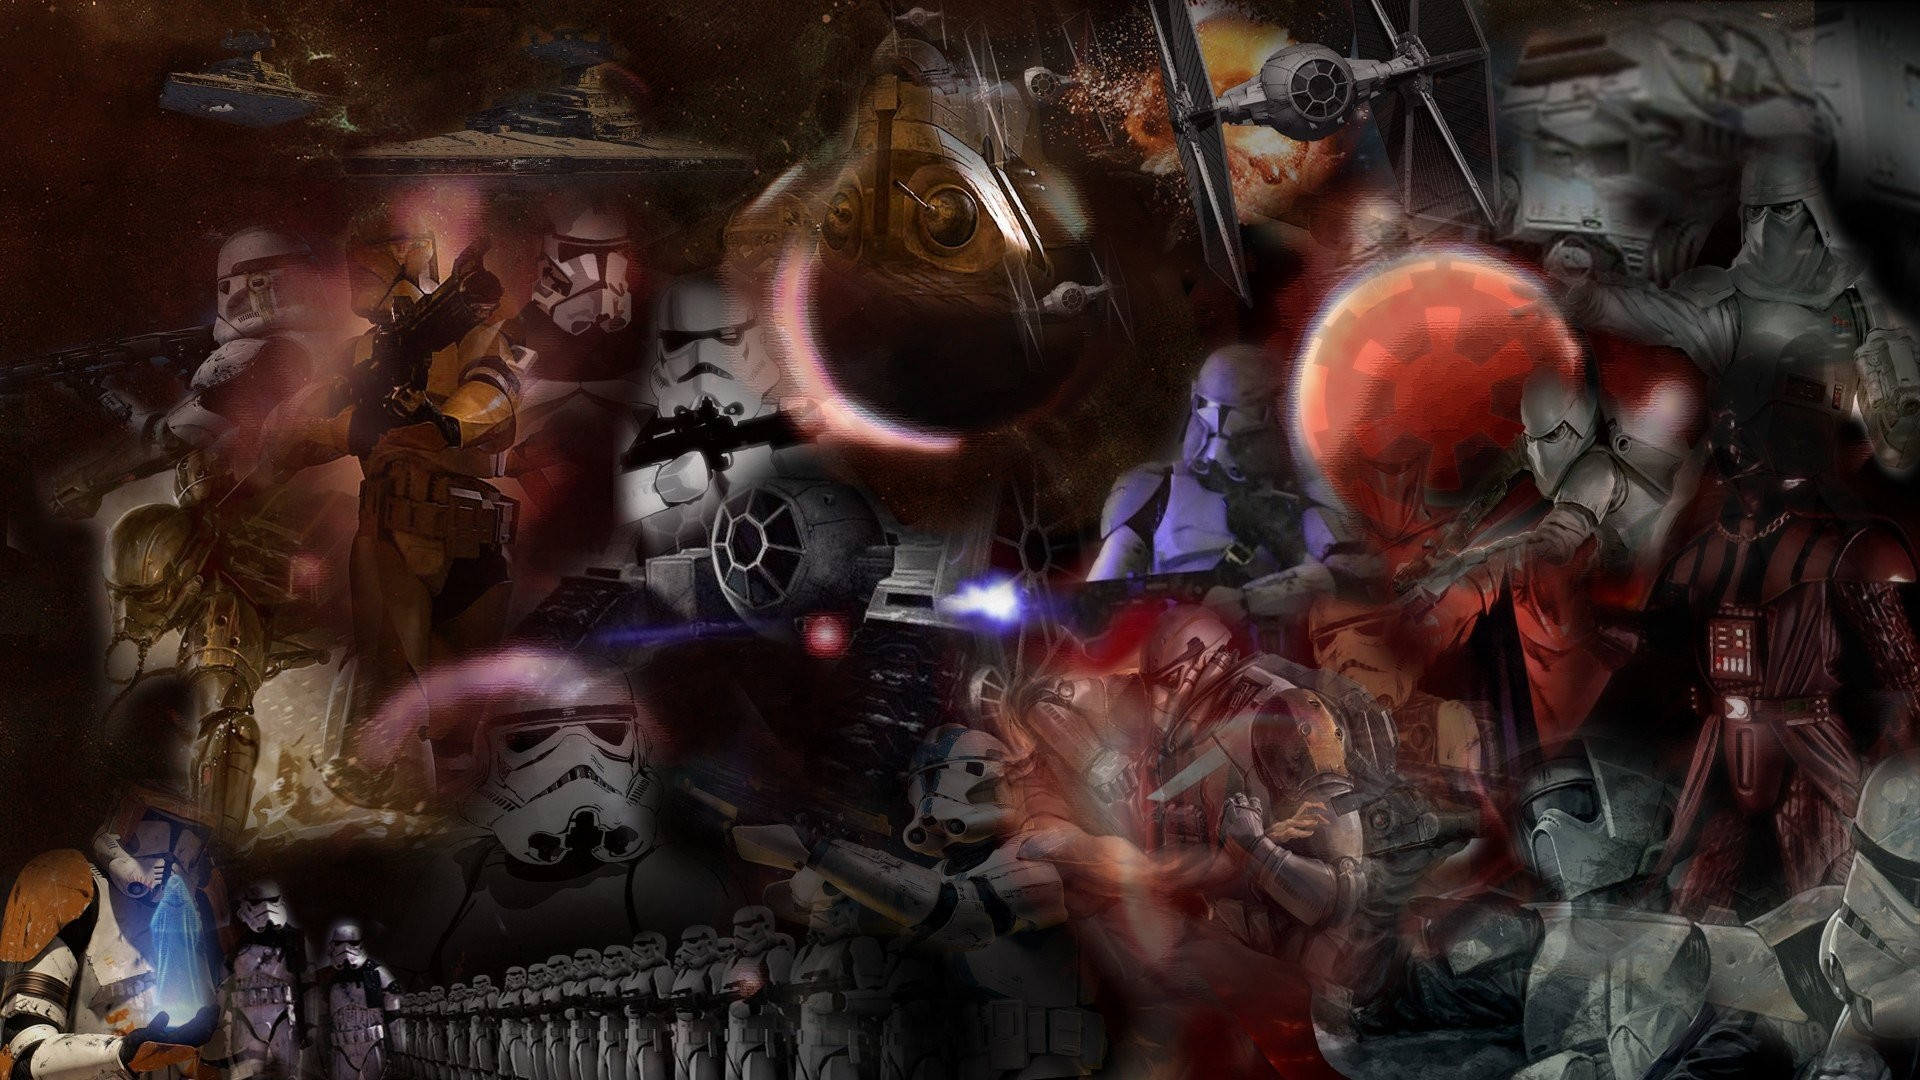 Star Wars army Clone Wars Darth Vader clone space station clone trooper  warriors wallpaper | | 291126 | WallpaperUP